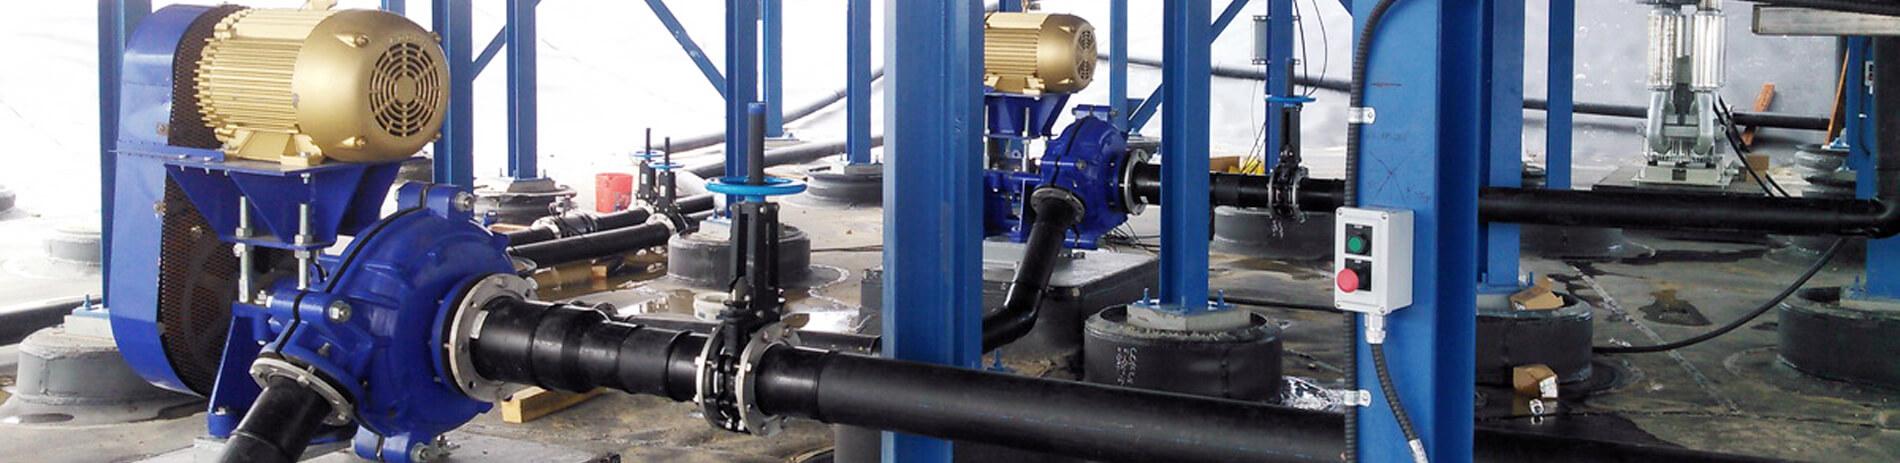 slurry pump application